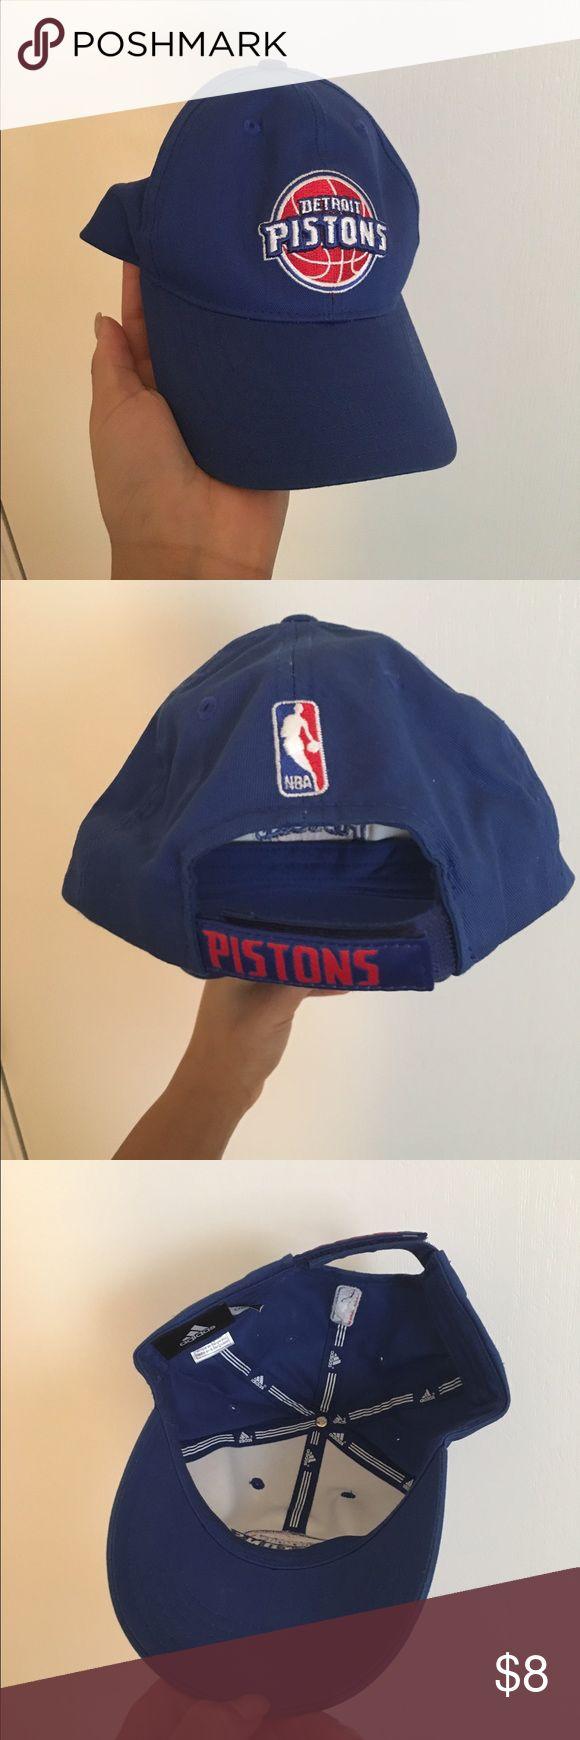 Adidas Detroit Pistons Baseball Cap Blue Adidas Baseball Cap Adidas Accessories Hats